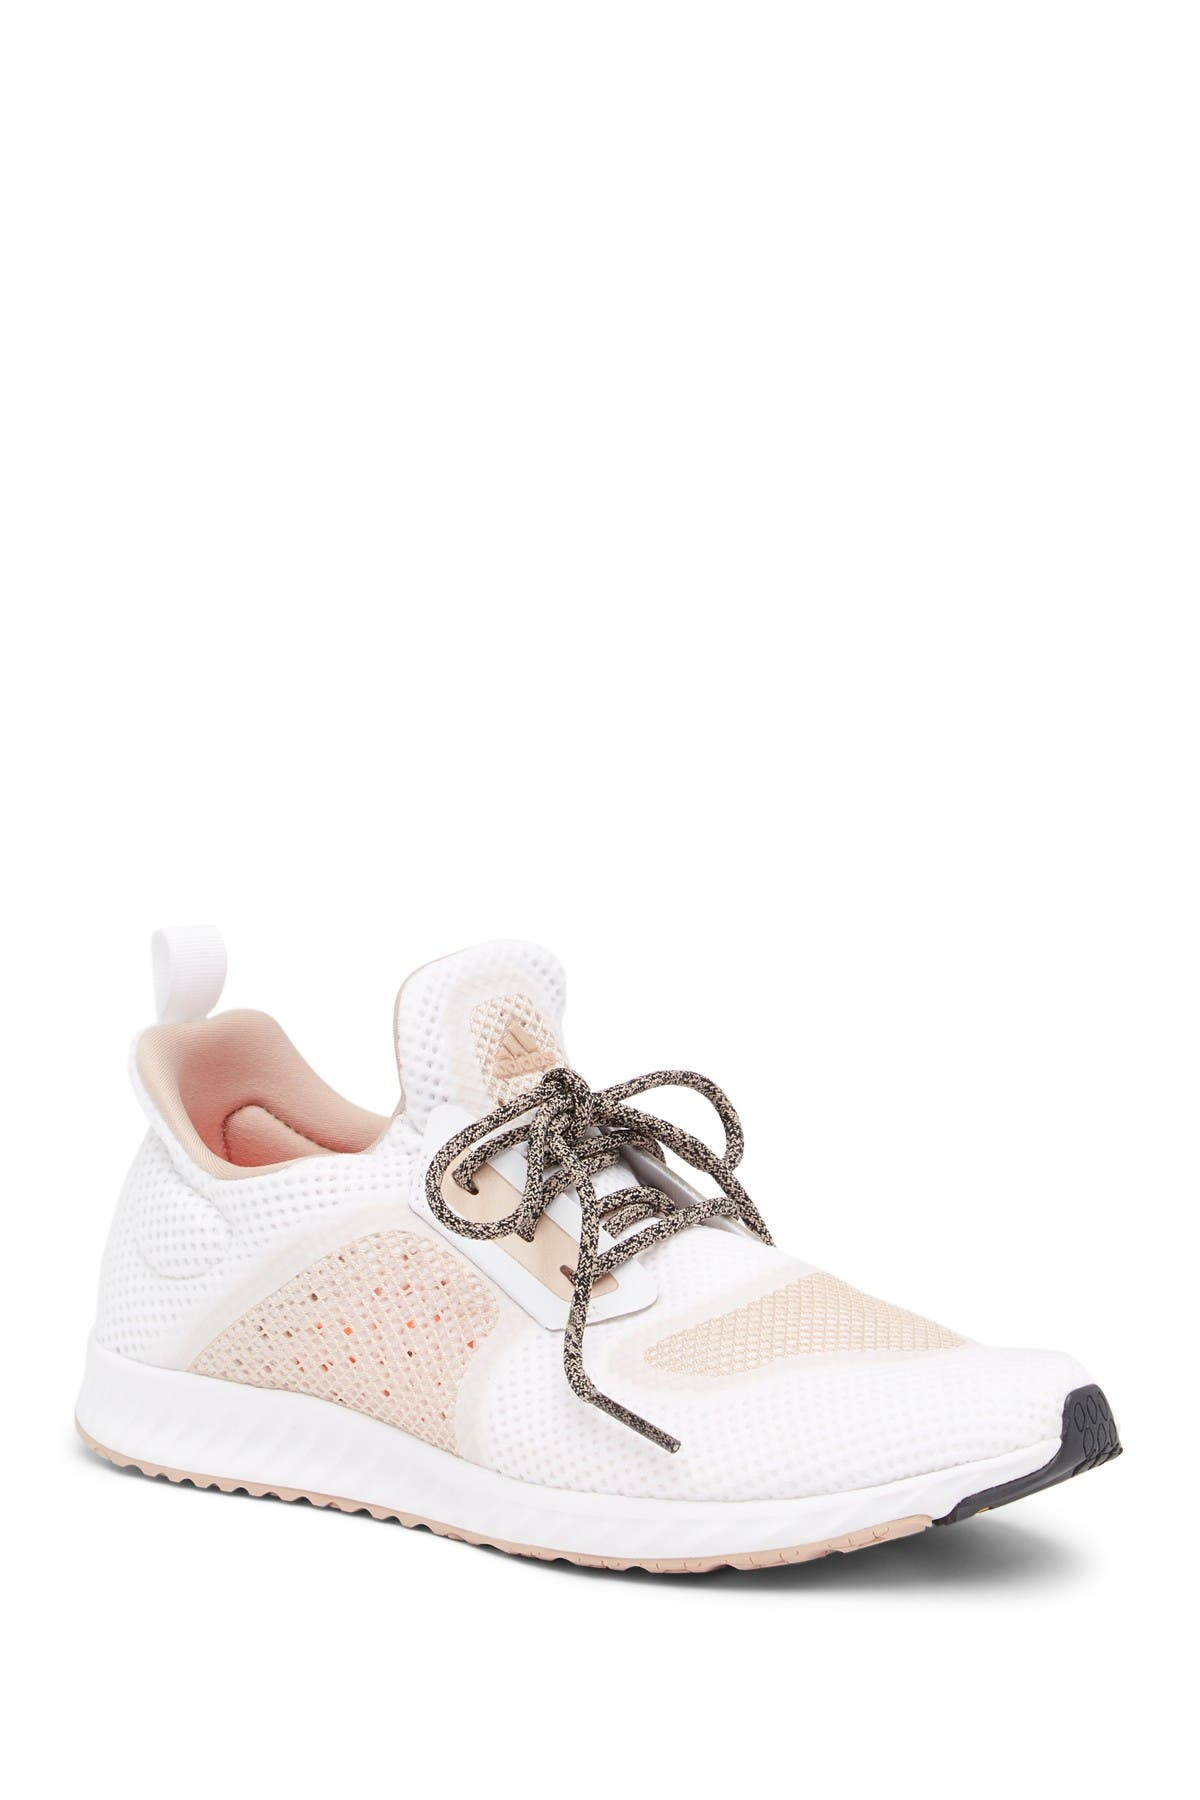 adidas | Edge Lux Clima Running Shoe